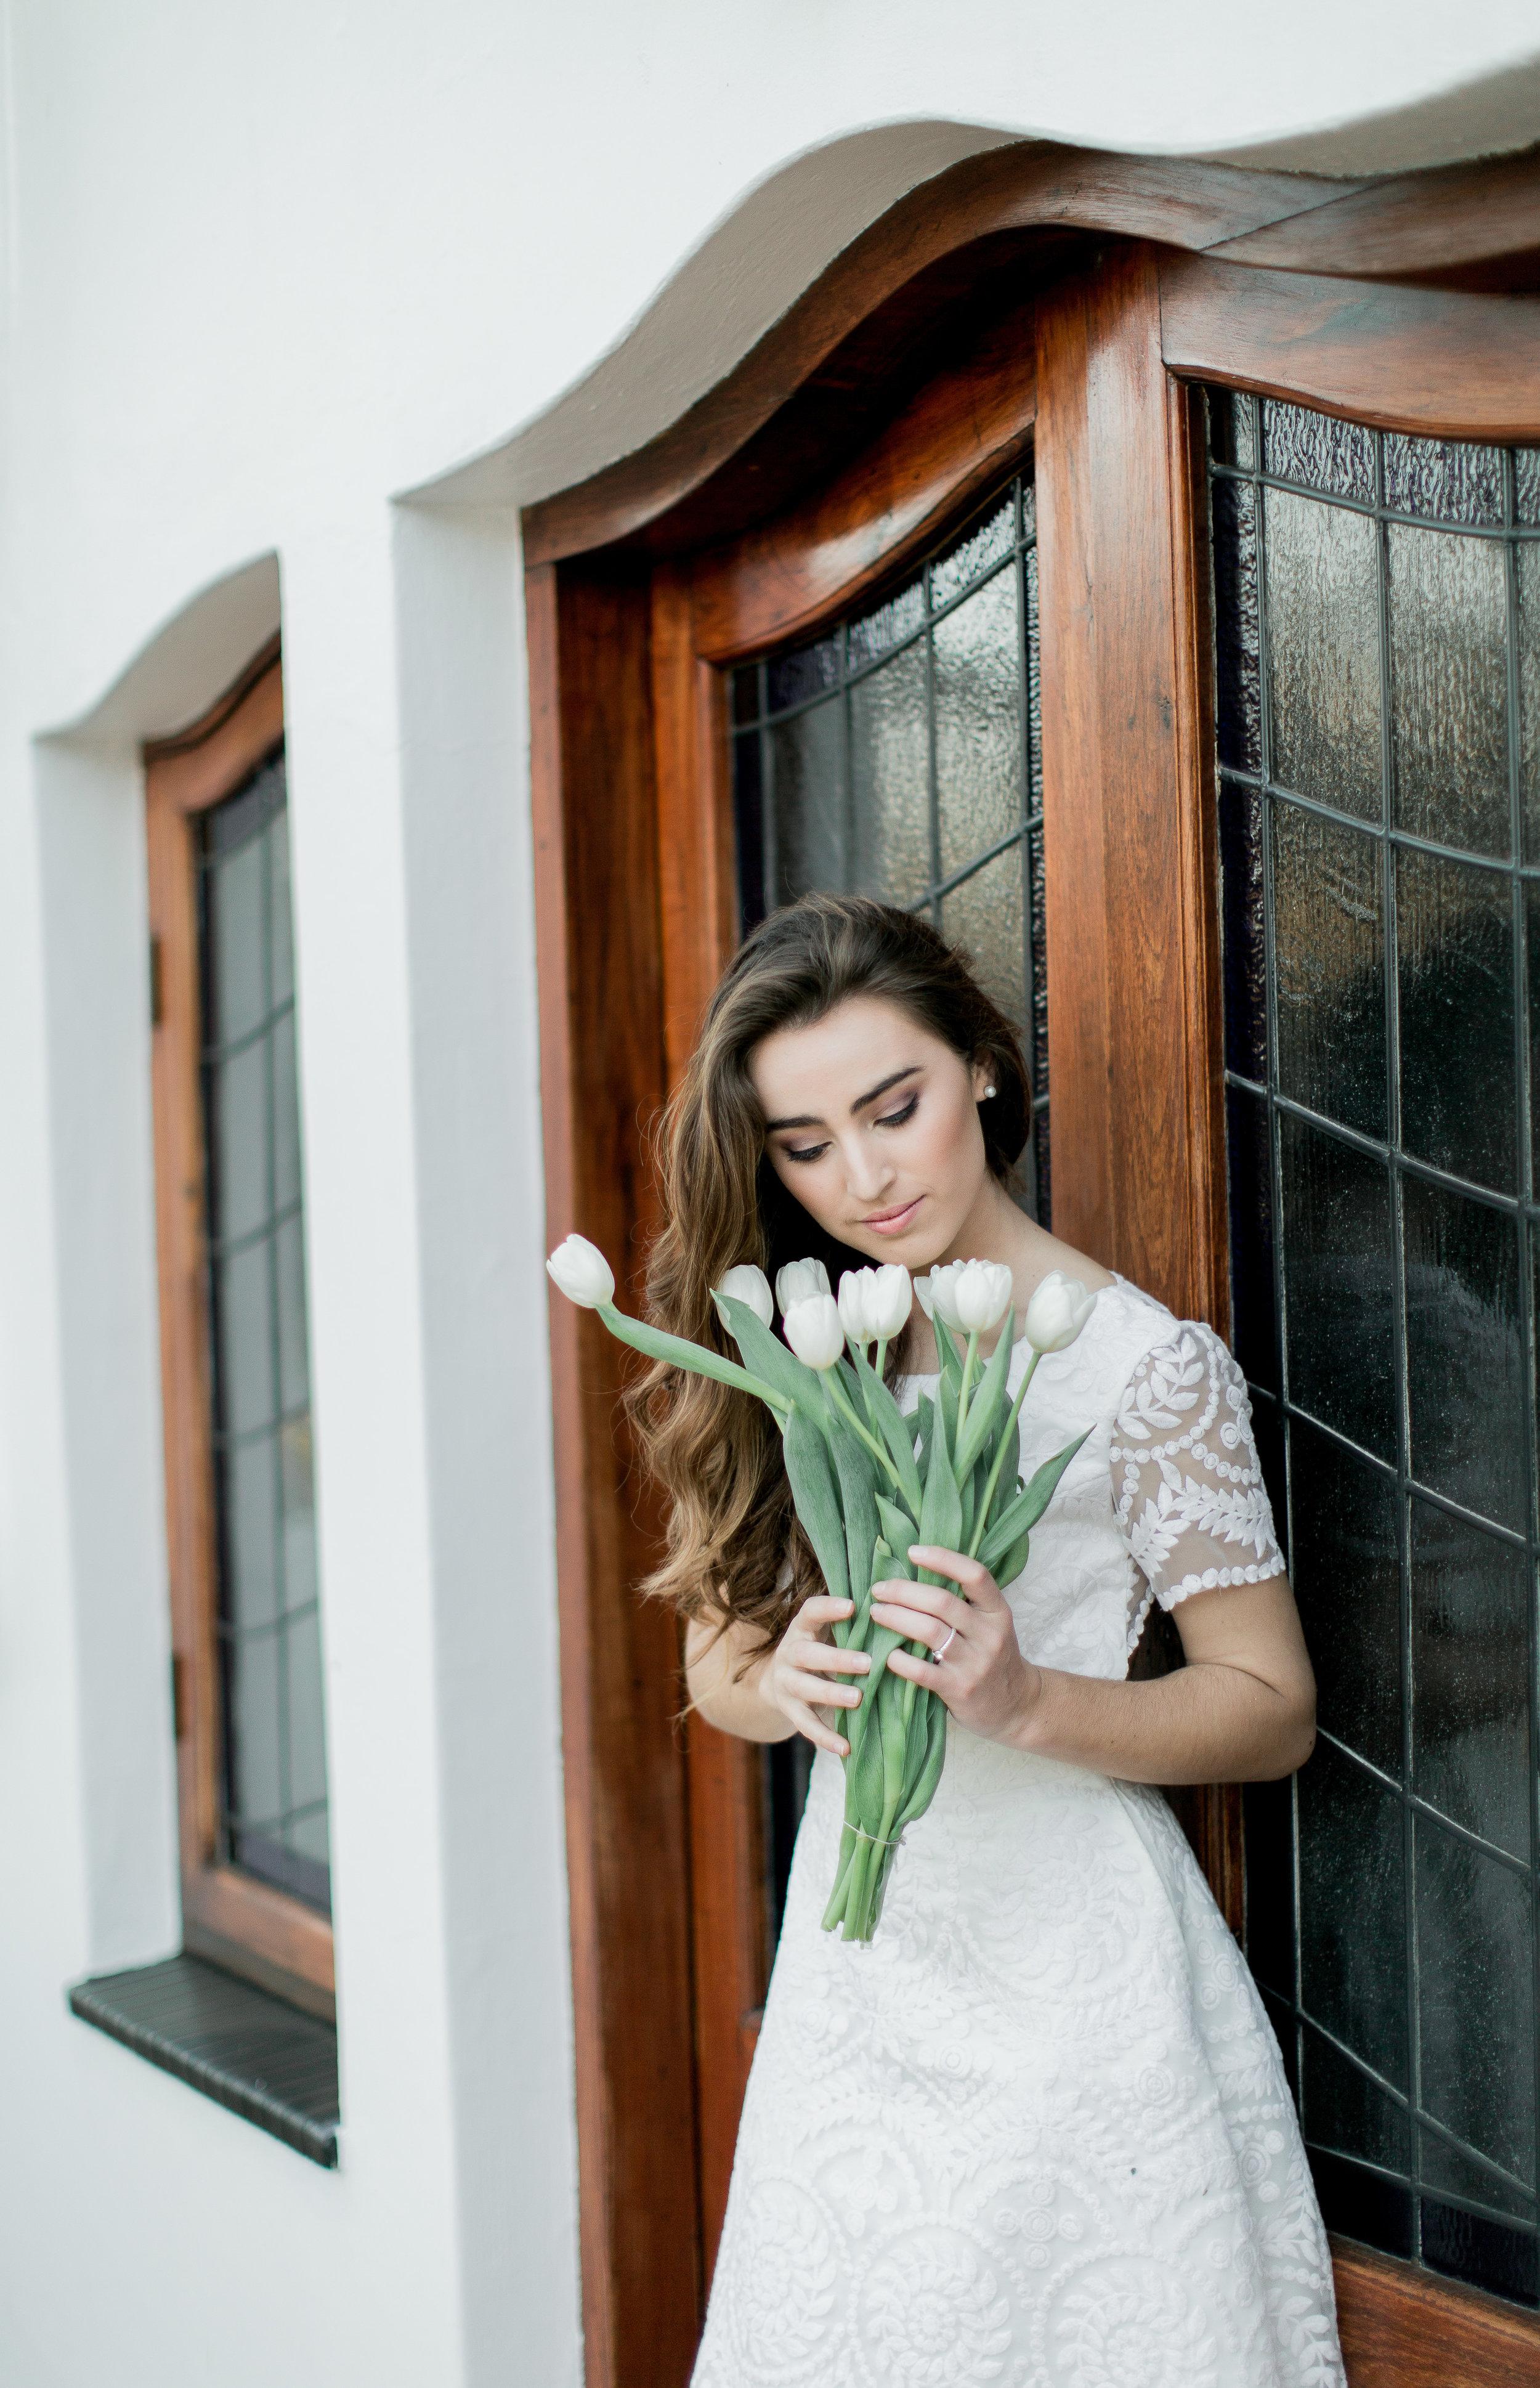 gauteng wedding photographer clareece smit17.jpg